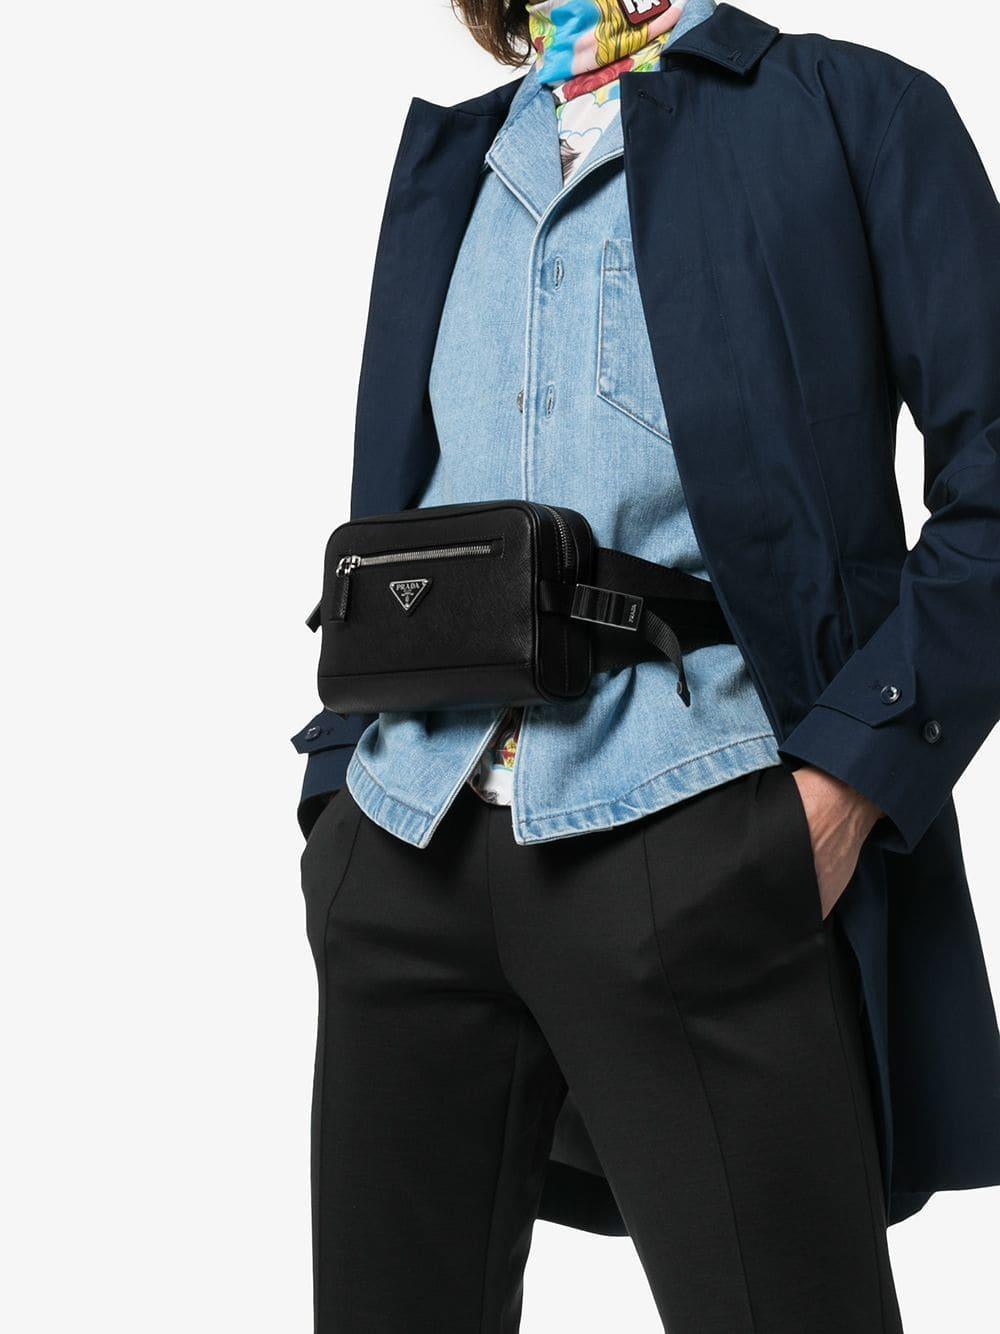 6515bfccad77b Prada Black Triangle Logo Belt Bag for men. View fullscreen